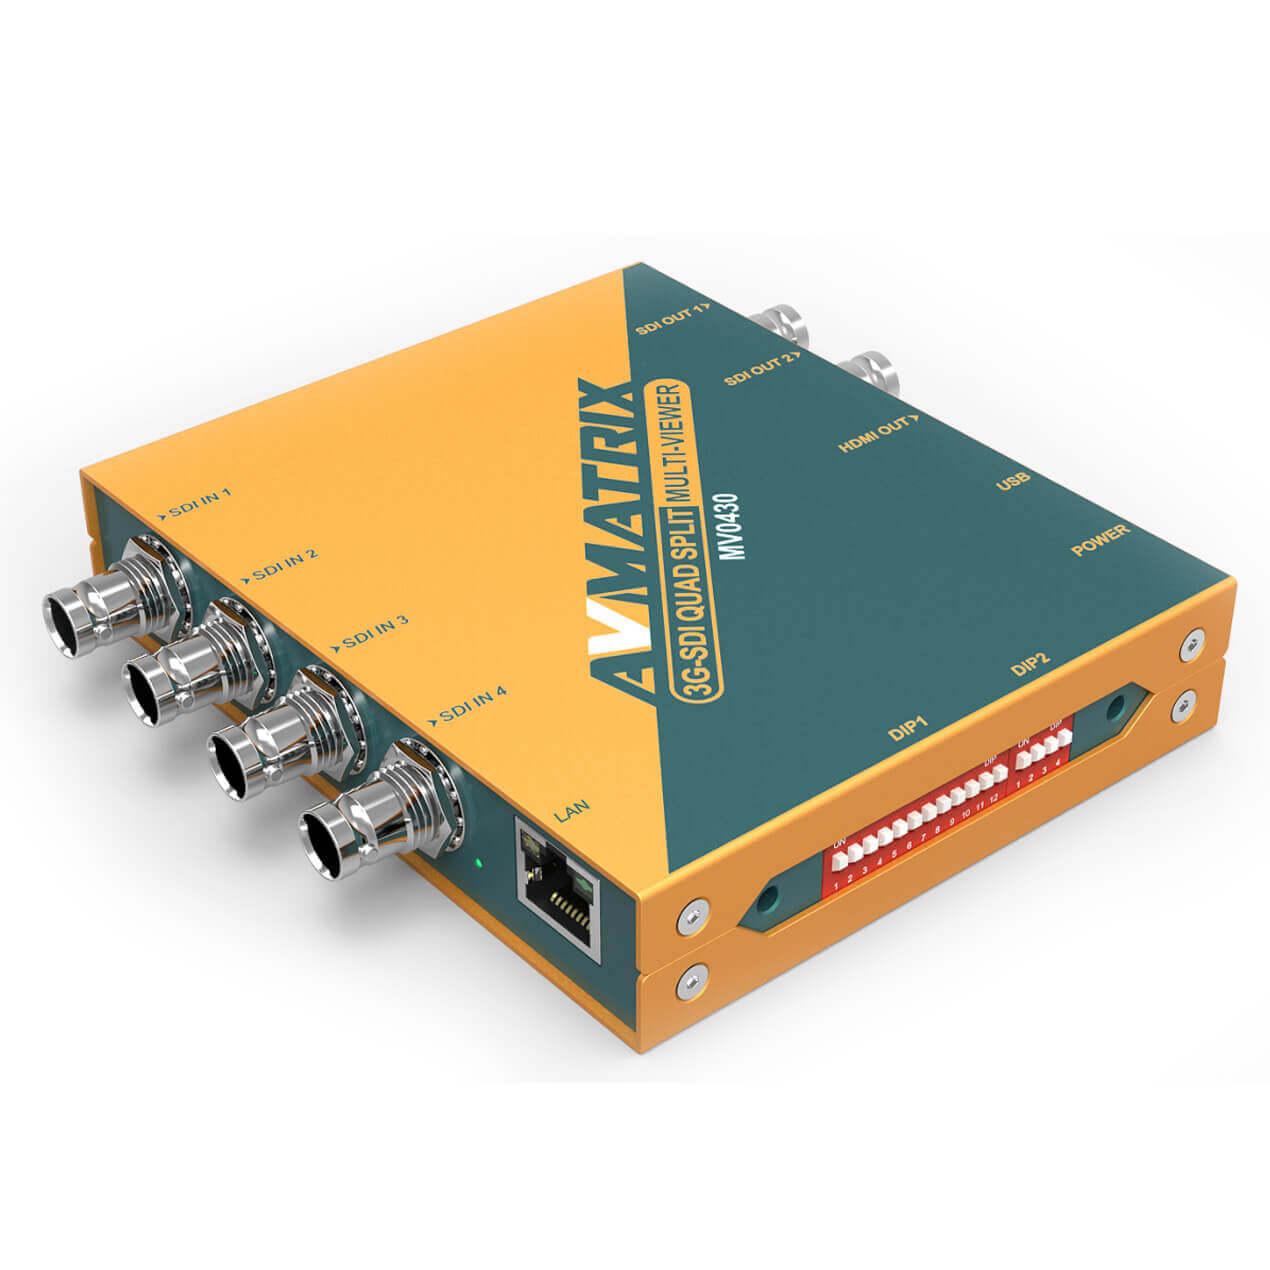 Artikelfoto AVMATRIX 3G-SDI QUAD SPLIT Multiviewer MV0430